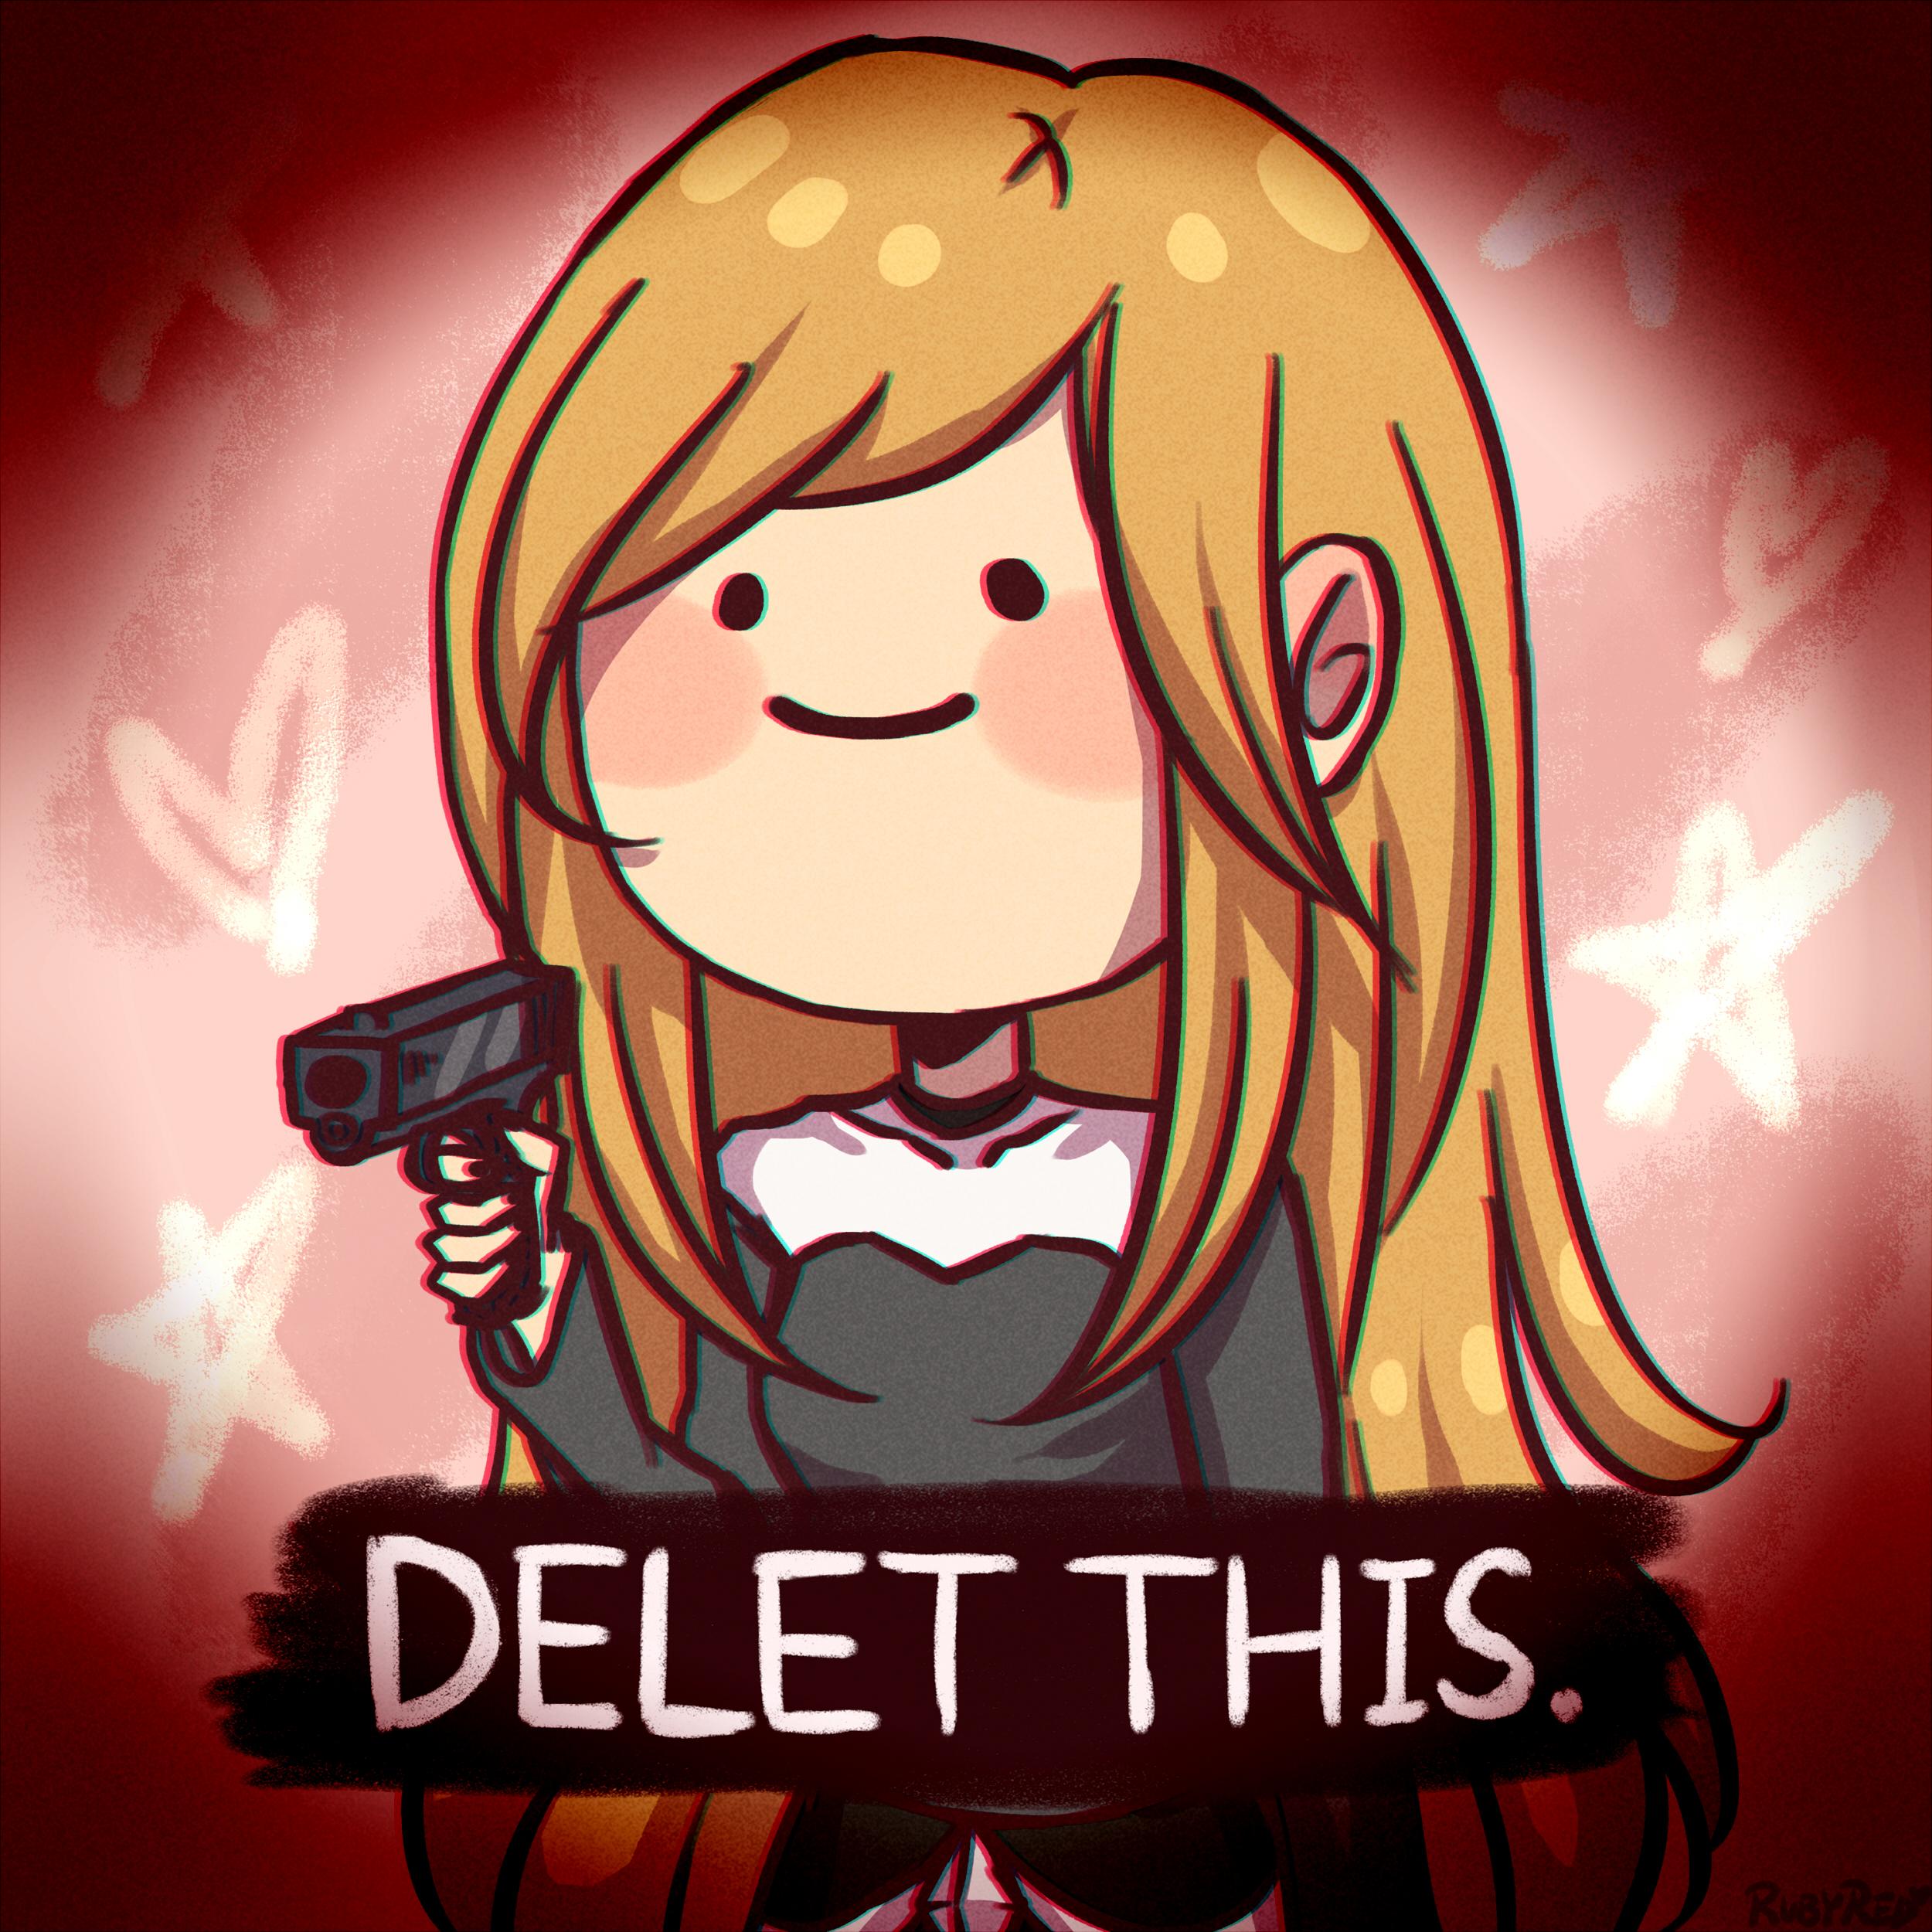 delet_dis.jpg